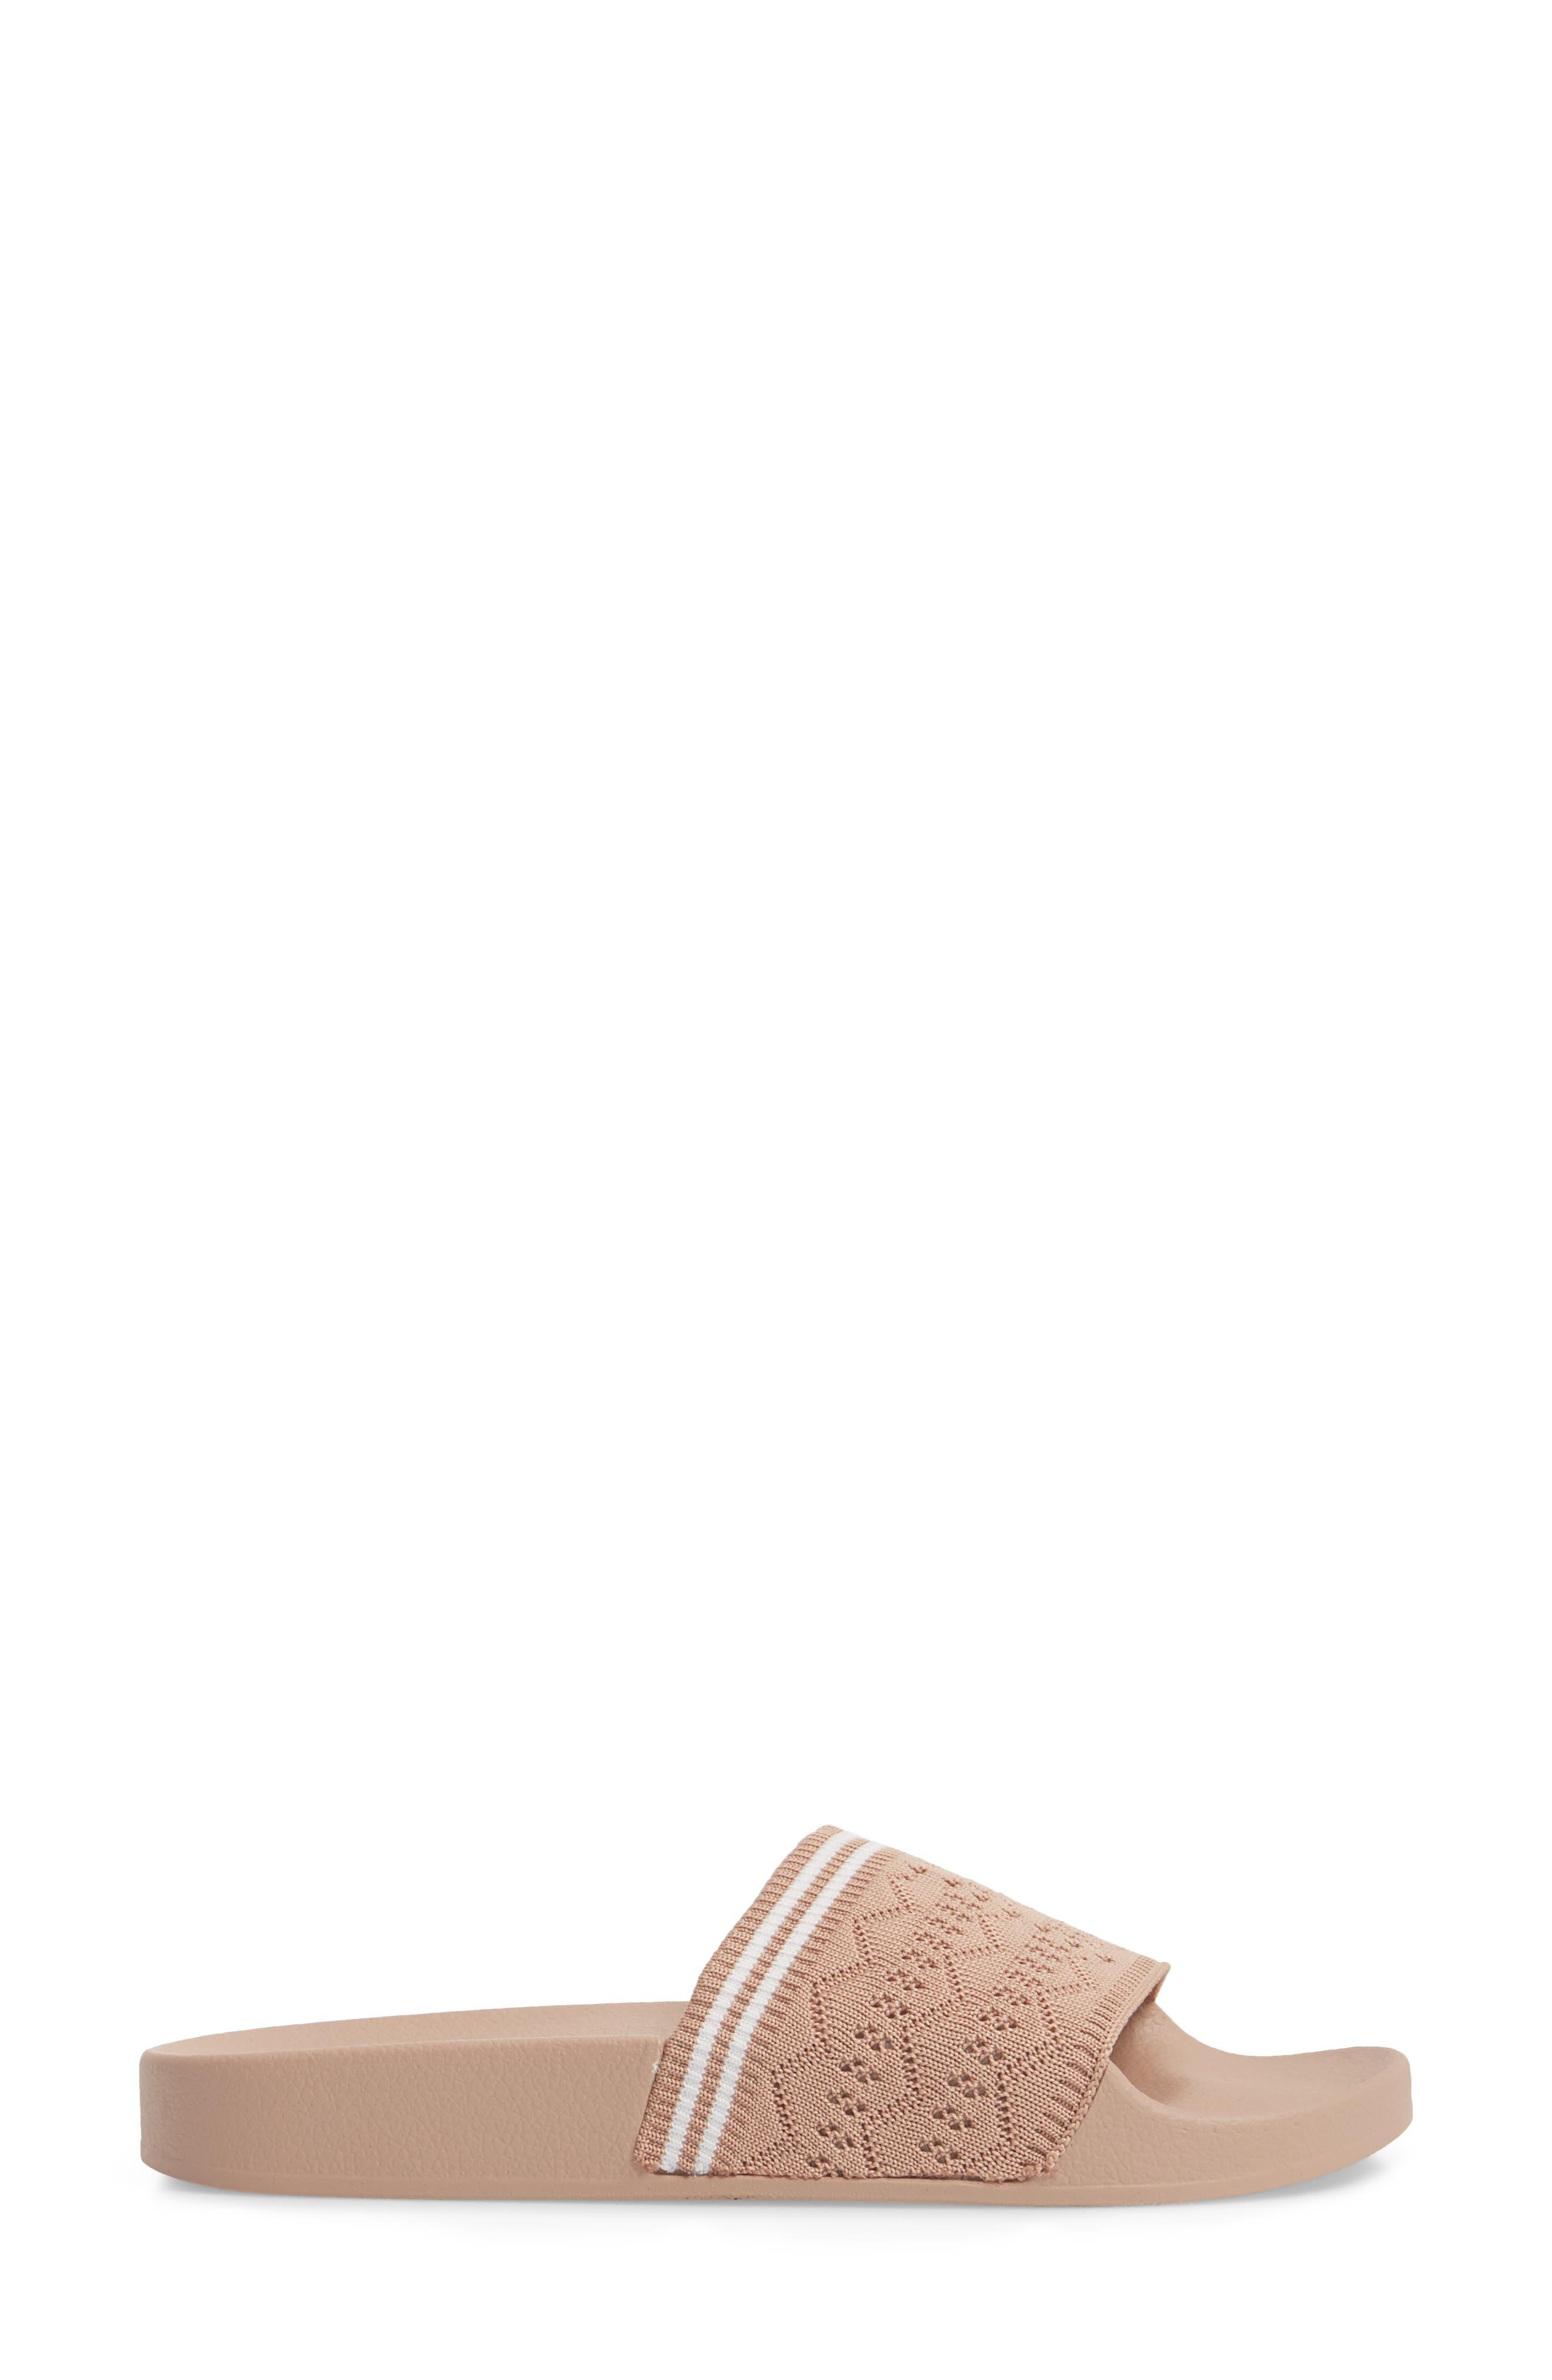 Vibe Sock Knit Slide Sandal,                             Alternate thumbnail 15, color,